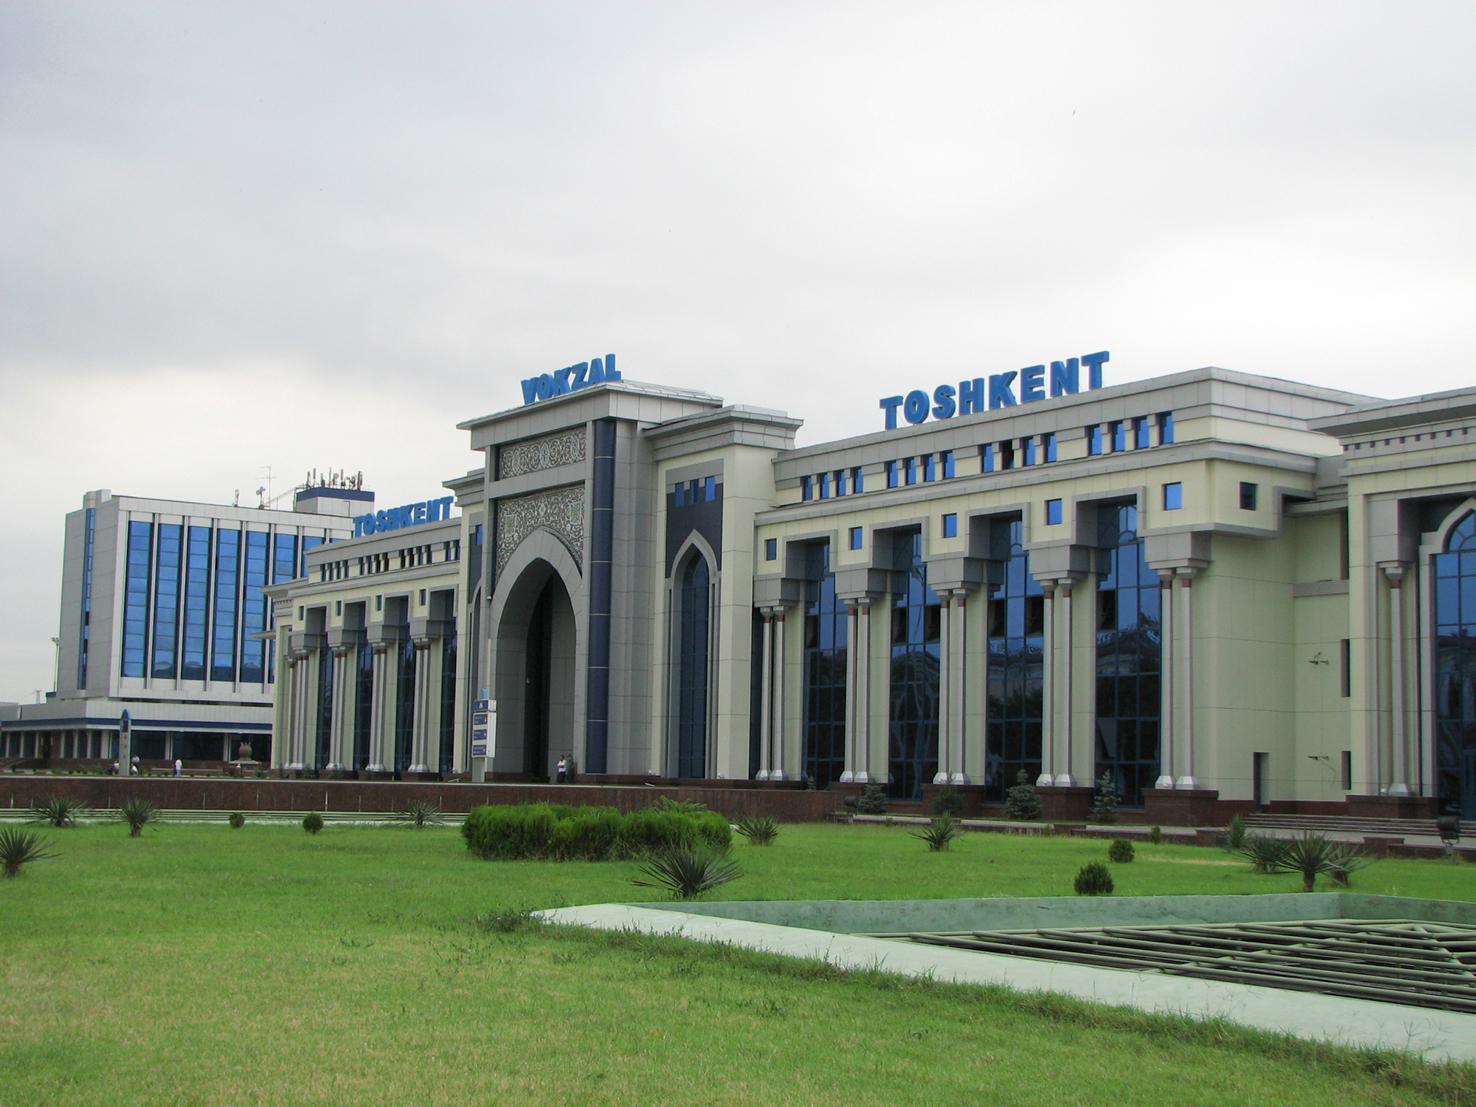 train Tashkent - Samarkand - Tashkent